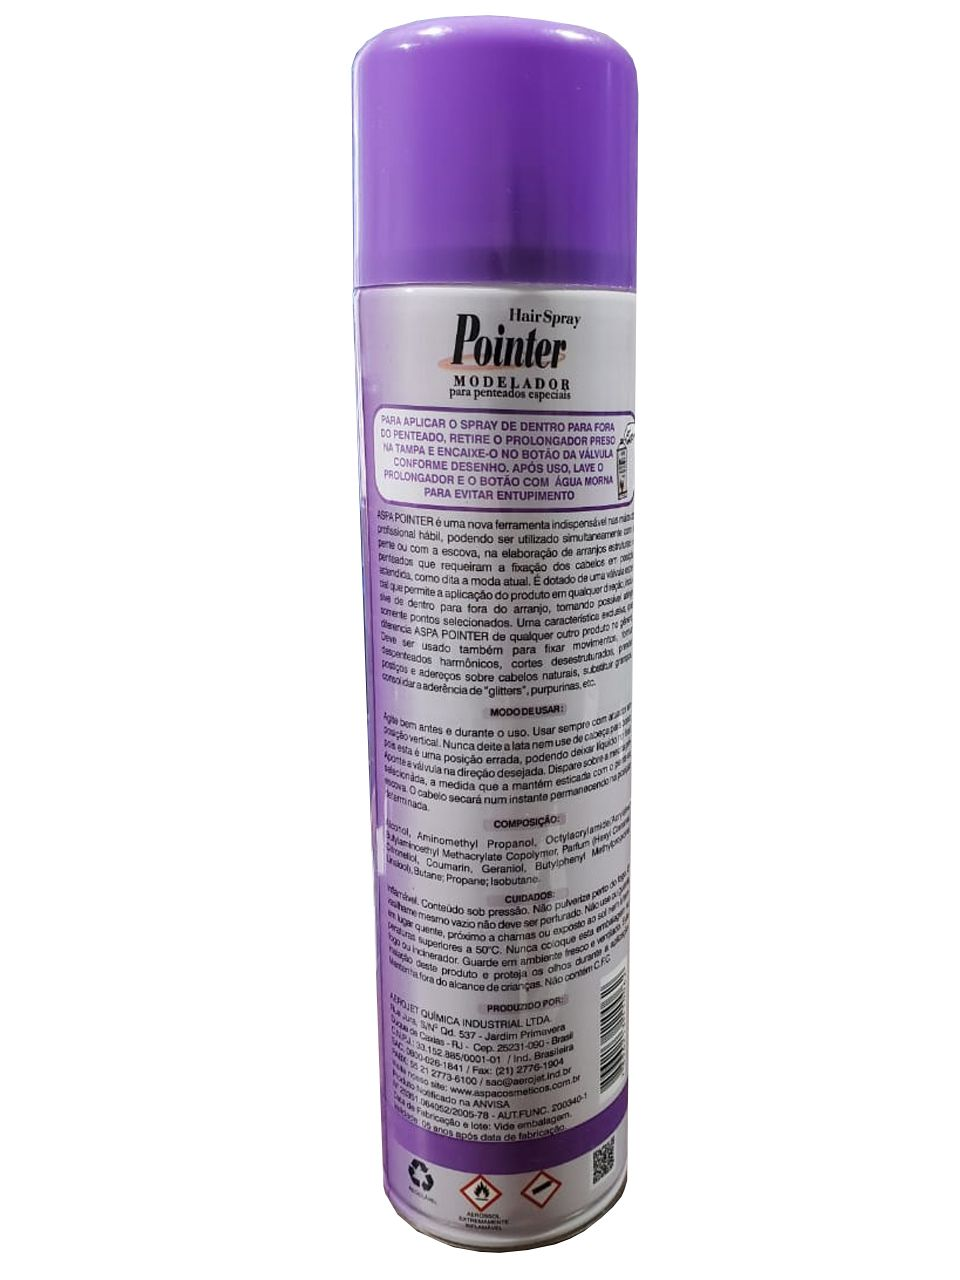 Kit 3 Und Spray Aspa Pointer Modelador De Penteados 300ml